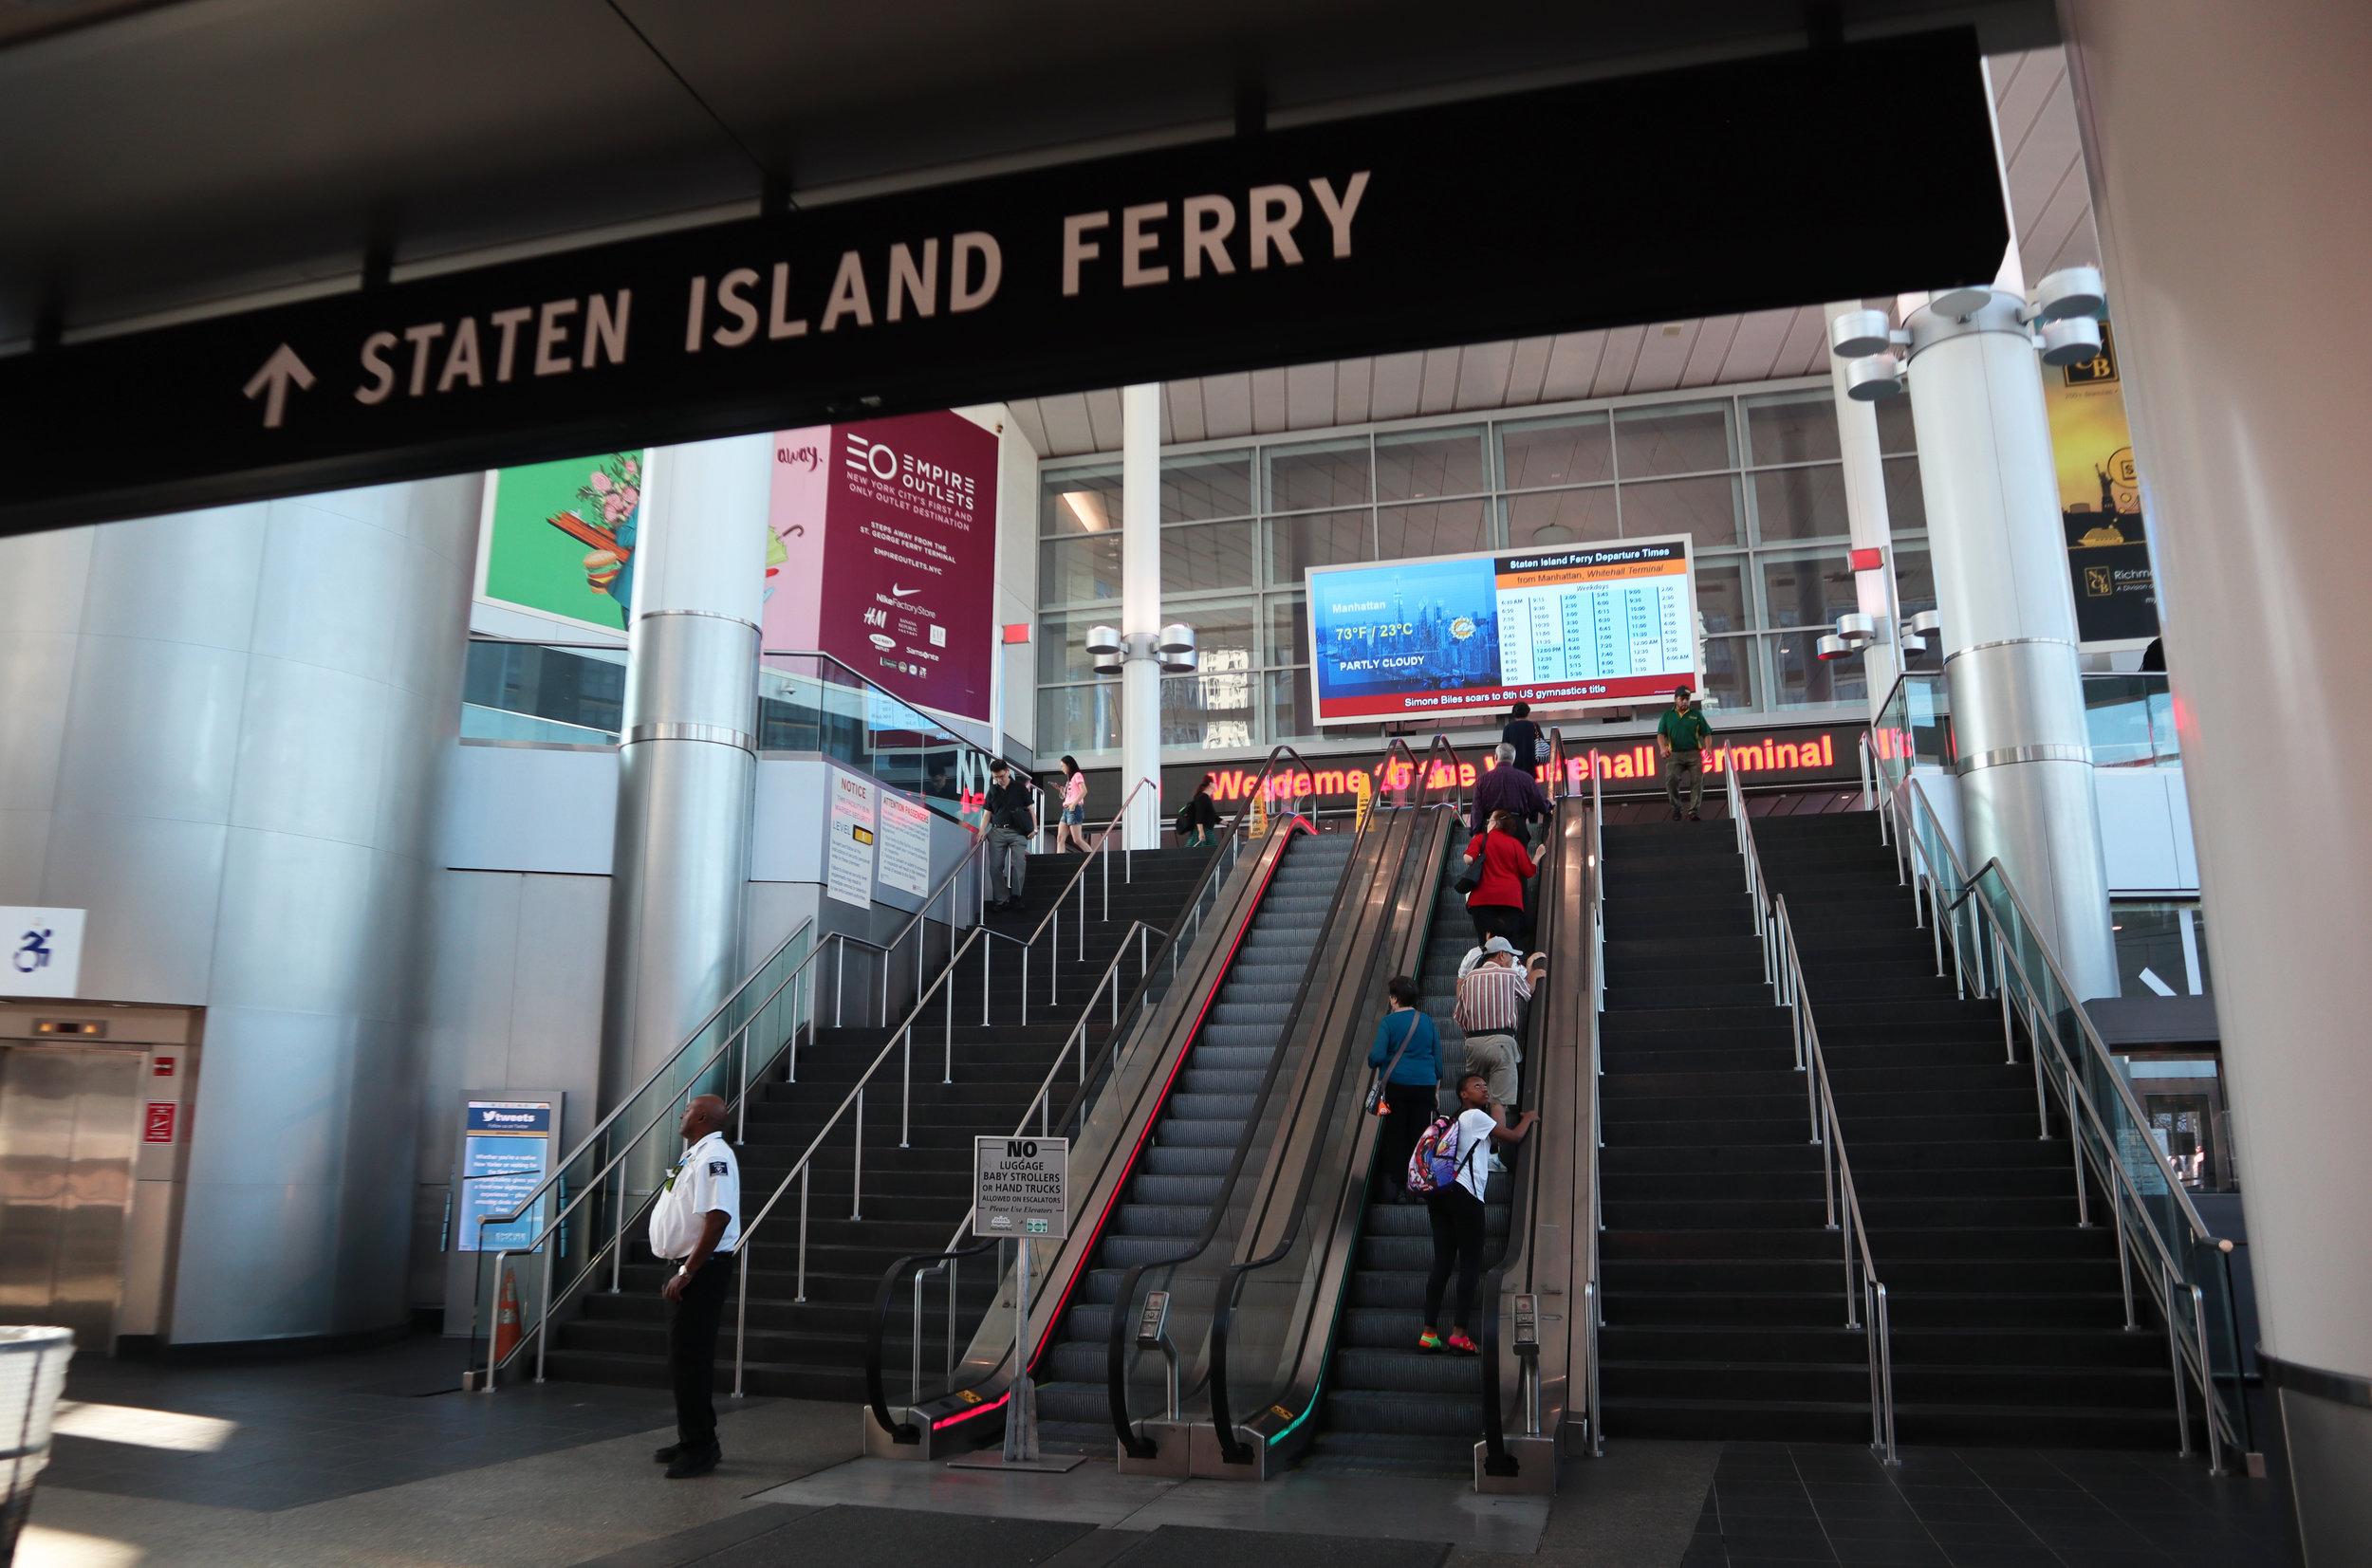 Внутри терминала Стейтен Айленд Ферри.jpg